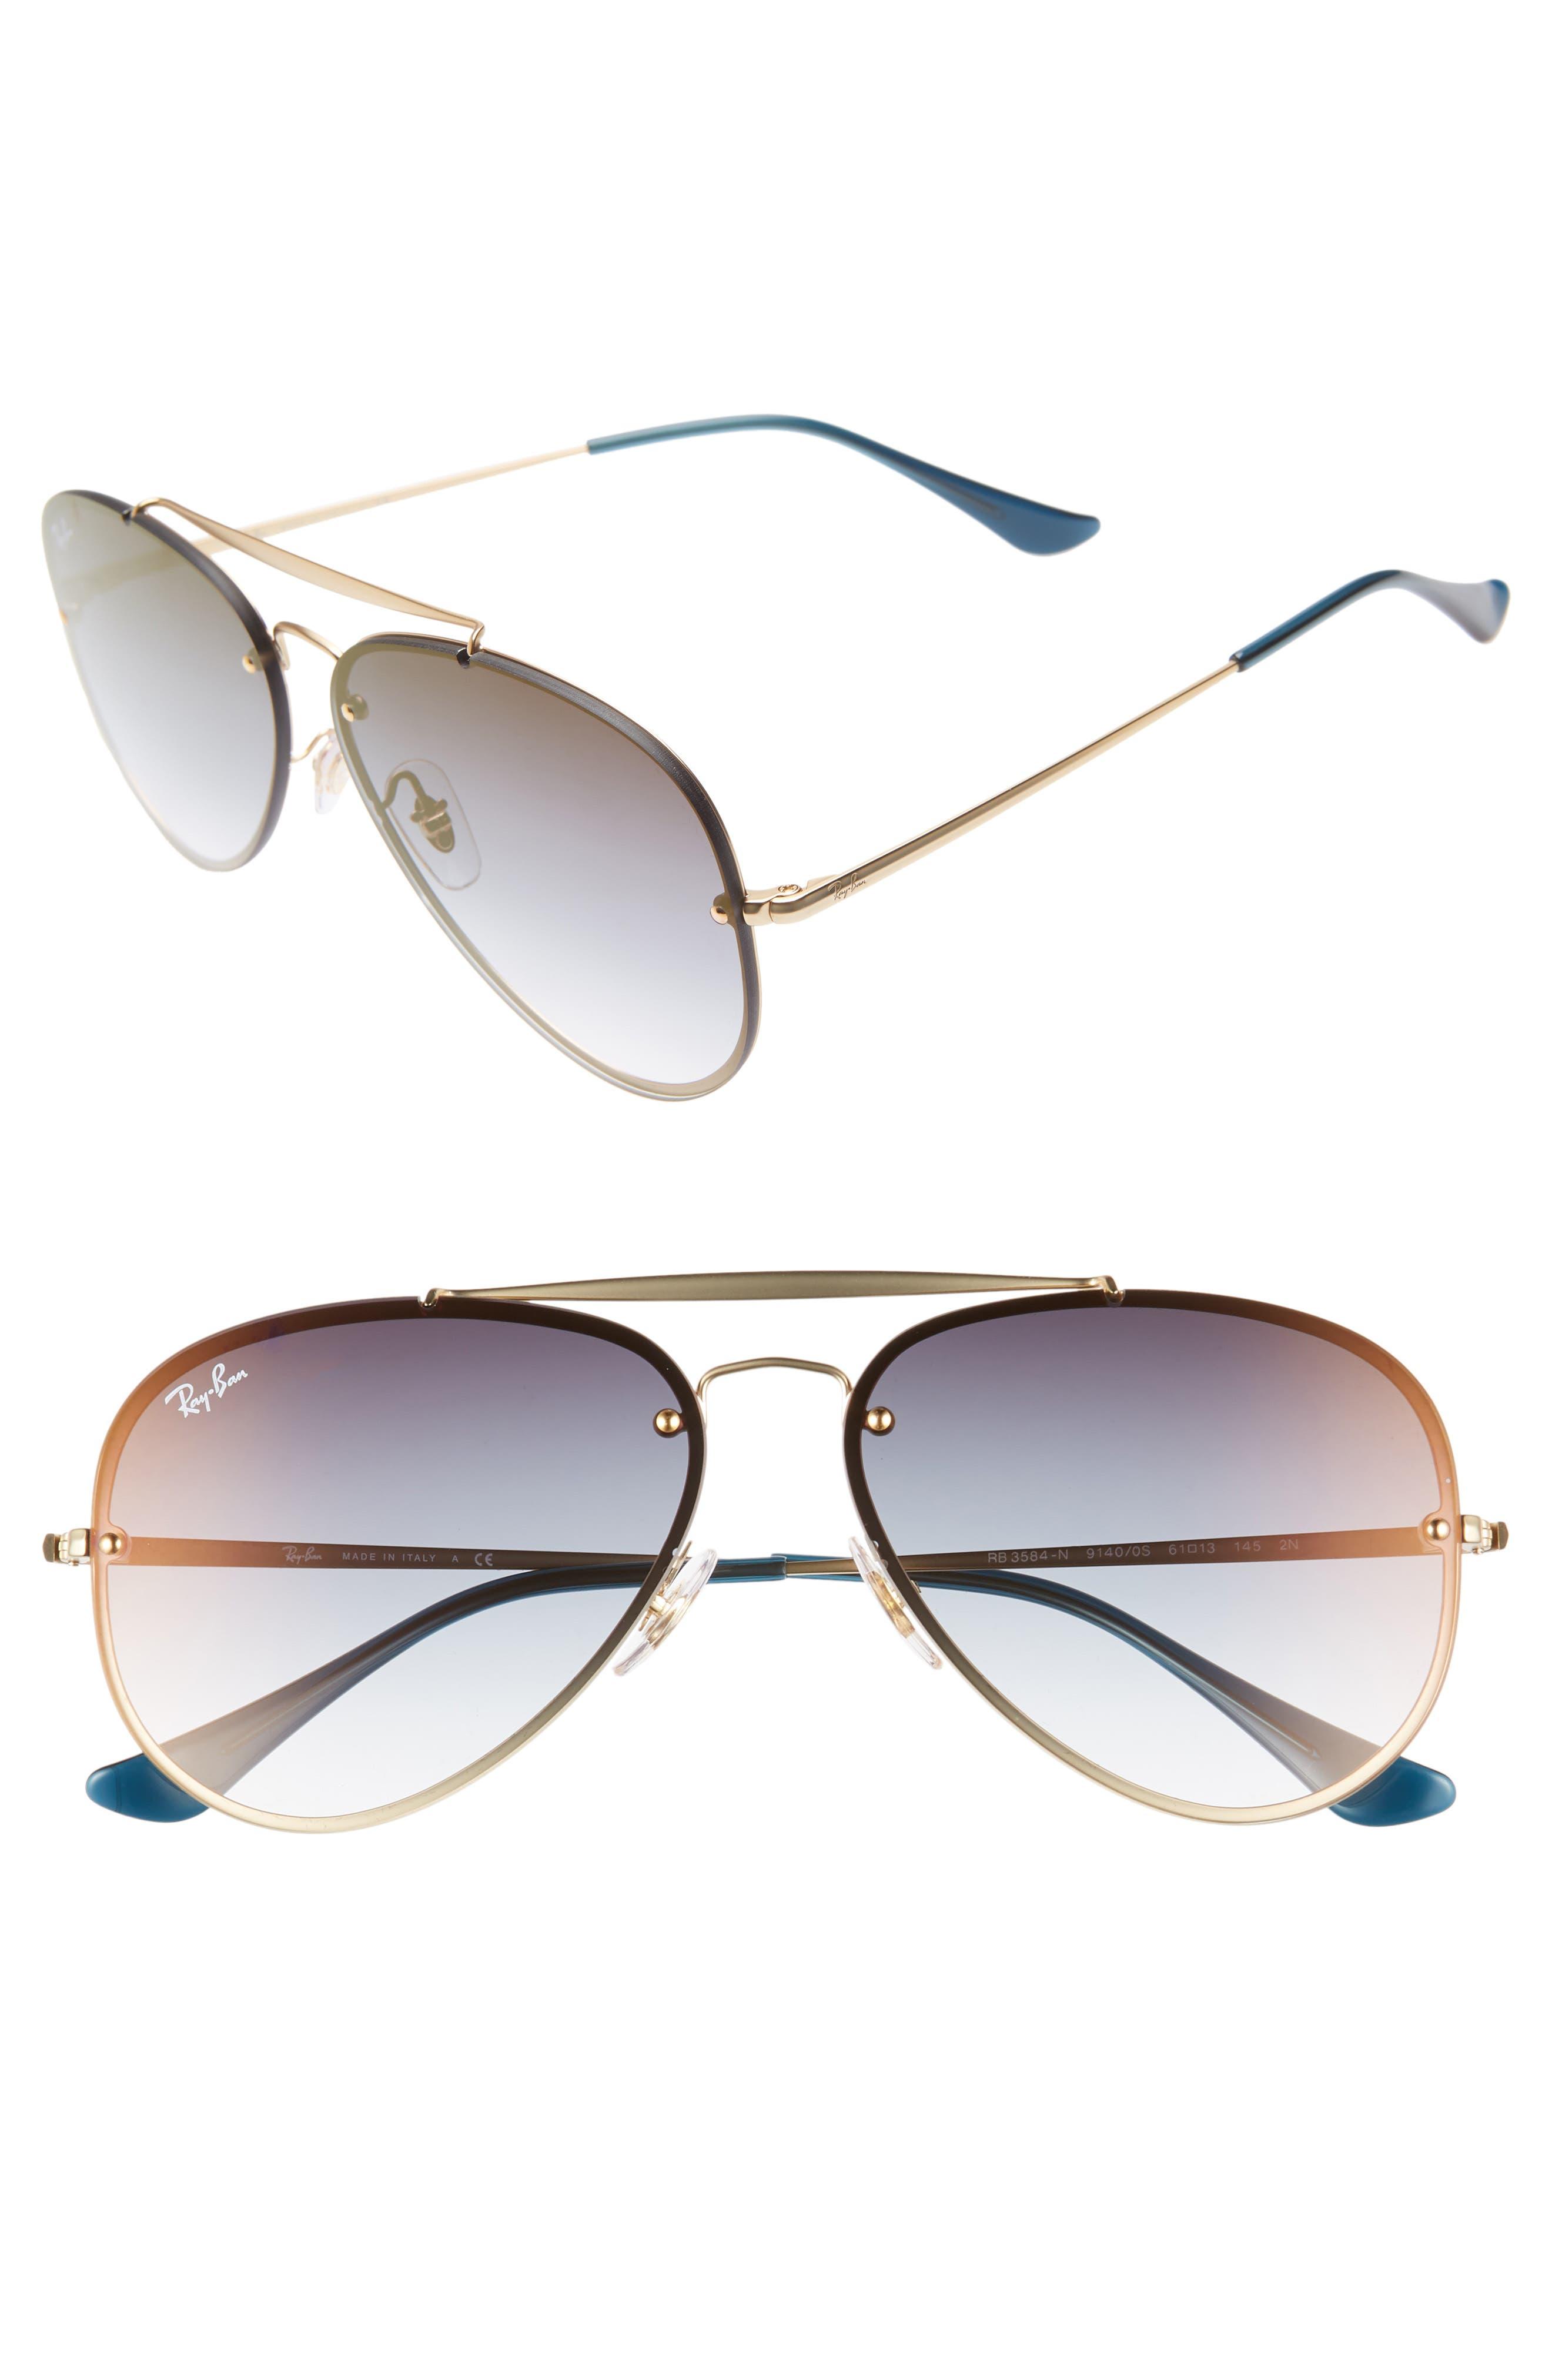 Ray-Ban 61Mm Gradient Lens Aviator Sunglasses - Gold/ Tran Blue Gradient